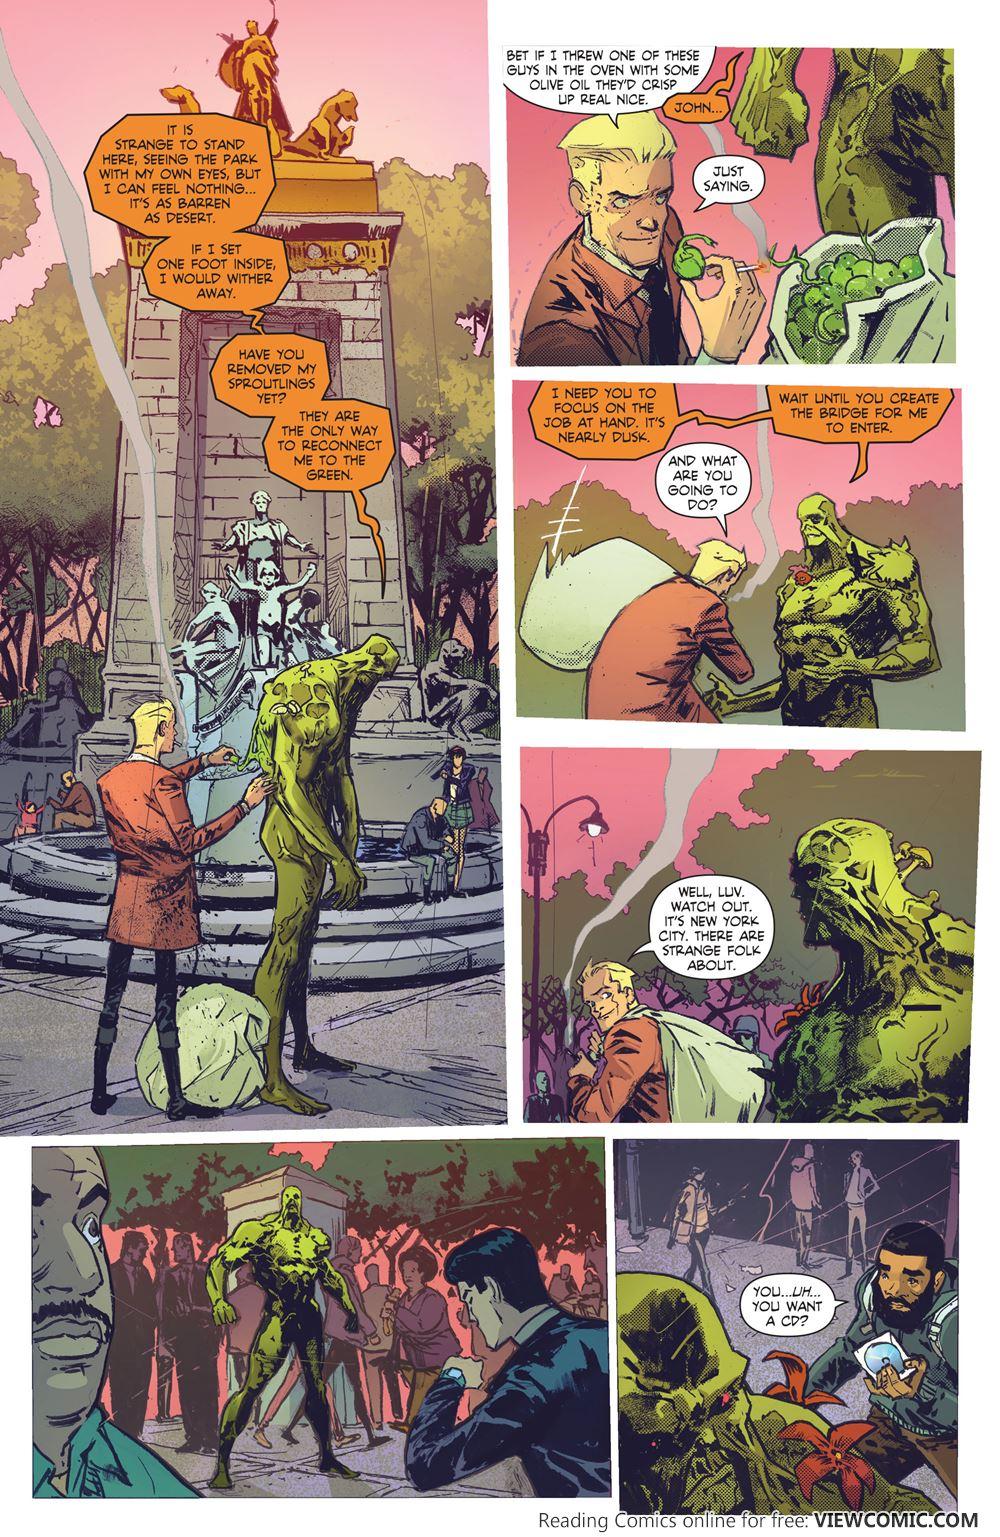 hellblazer read comic